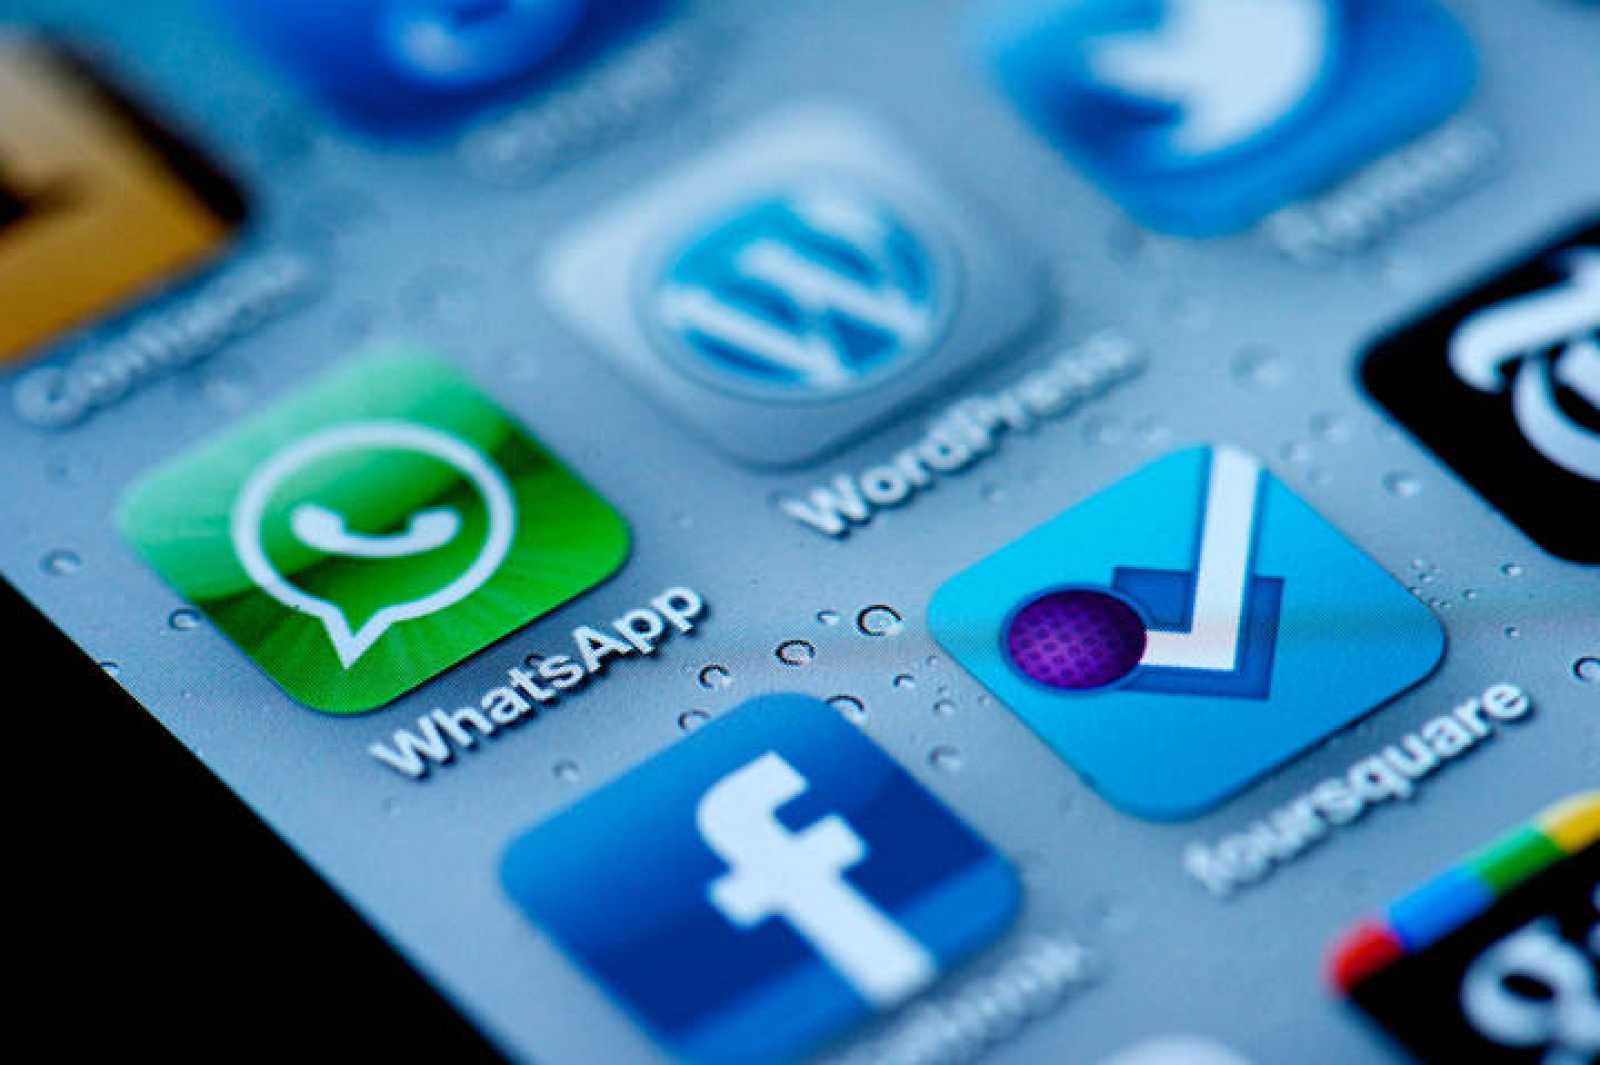 Expertos informáticos han desvelado diferentes fallos de seguridad de WhatsApp